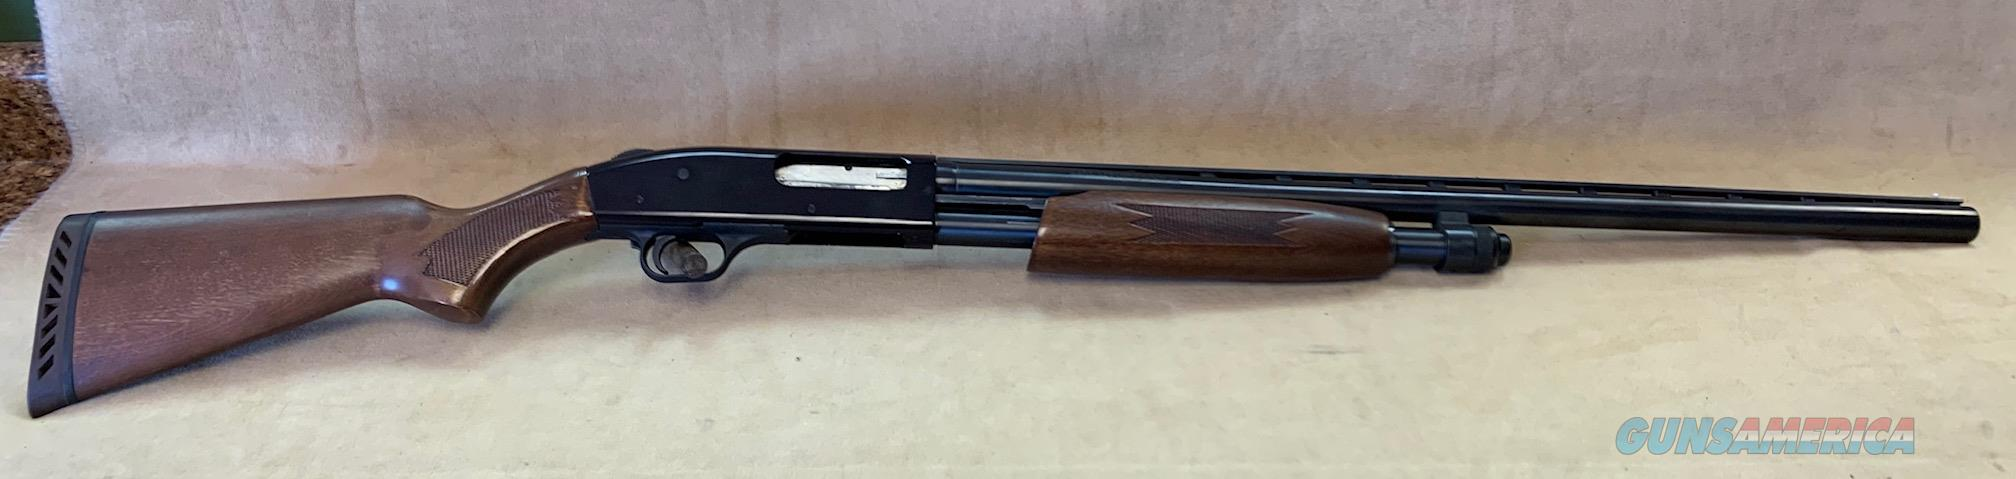 Mossberg 835 Ultimag Wood 12 gauge Consignment  Guns > Shotguns > Mossberg Shotguns > Pump > Sporting